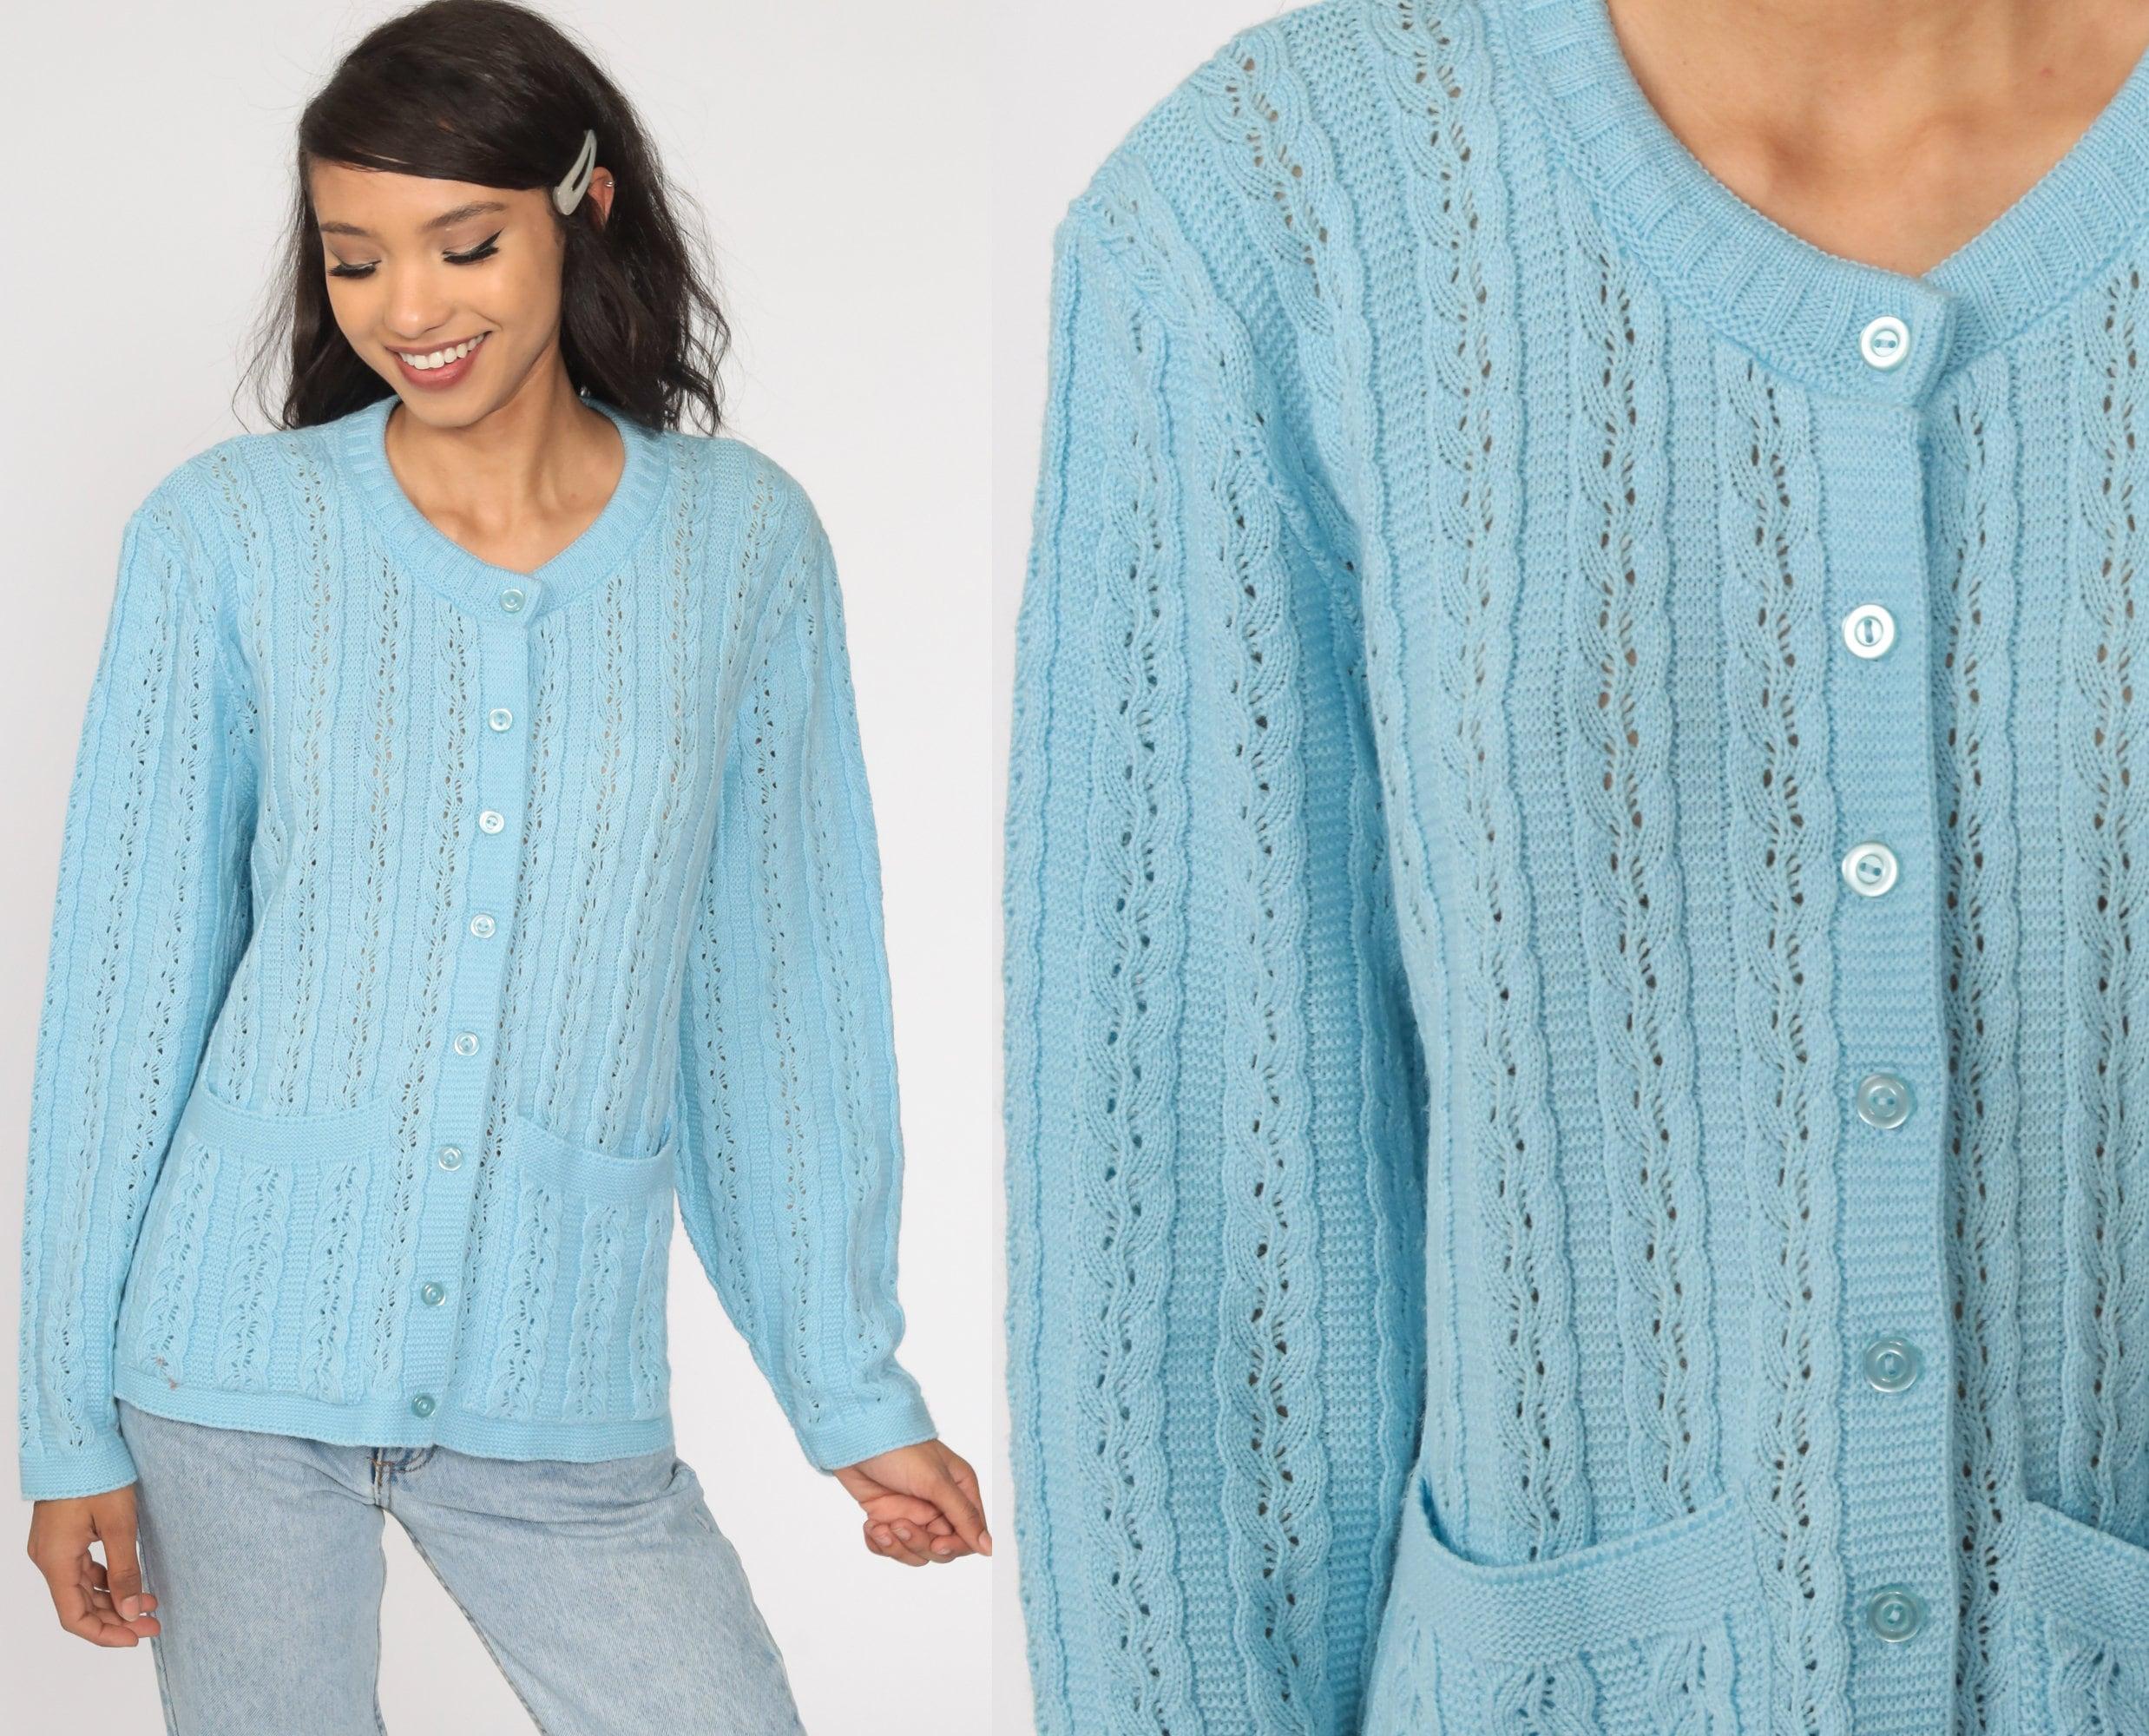 vintage 1970s pointelle sweater 70s navy sweater vest open weave knit tee layering lightweight sweater